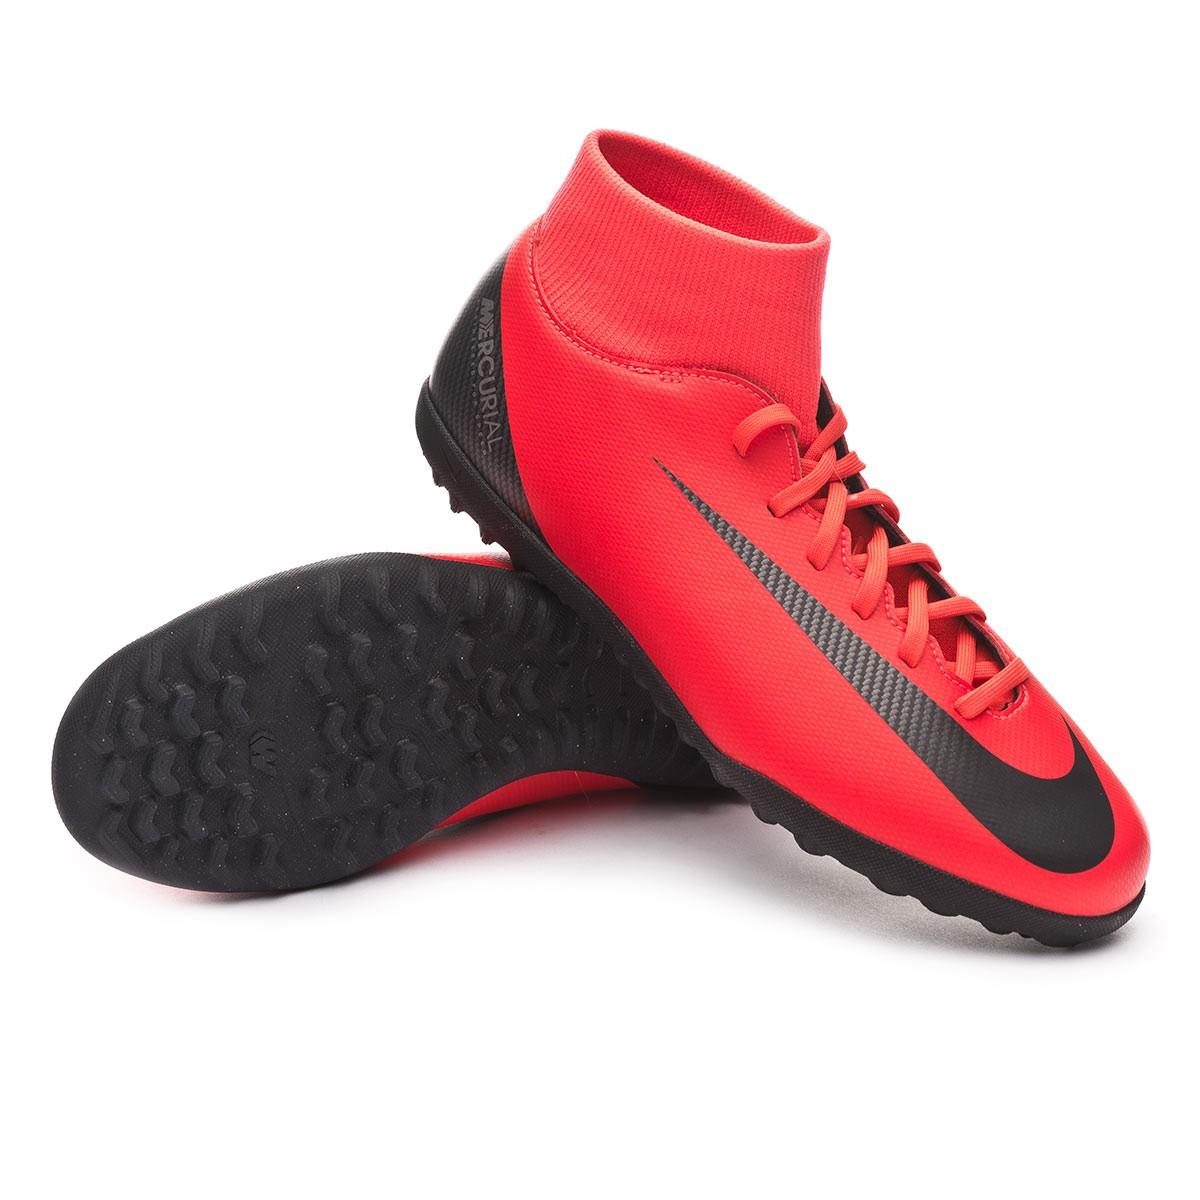 86102f7ea37 Sapatilhas Nike Mercurial SuperflyX VI Club CR7 Turf Bright crimson ...